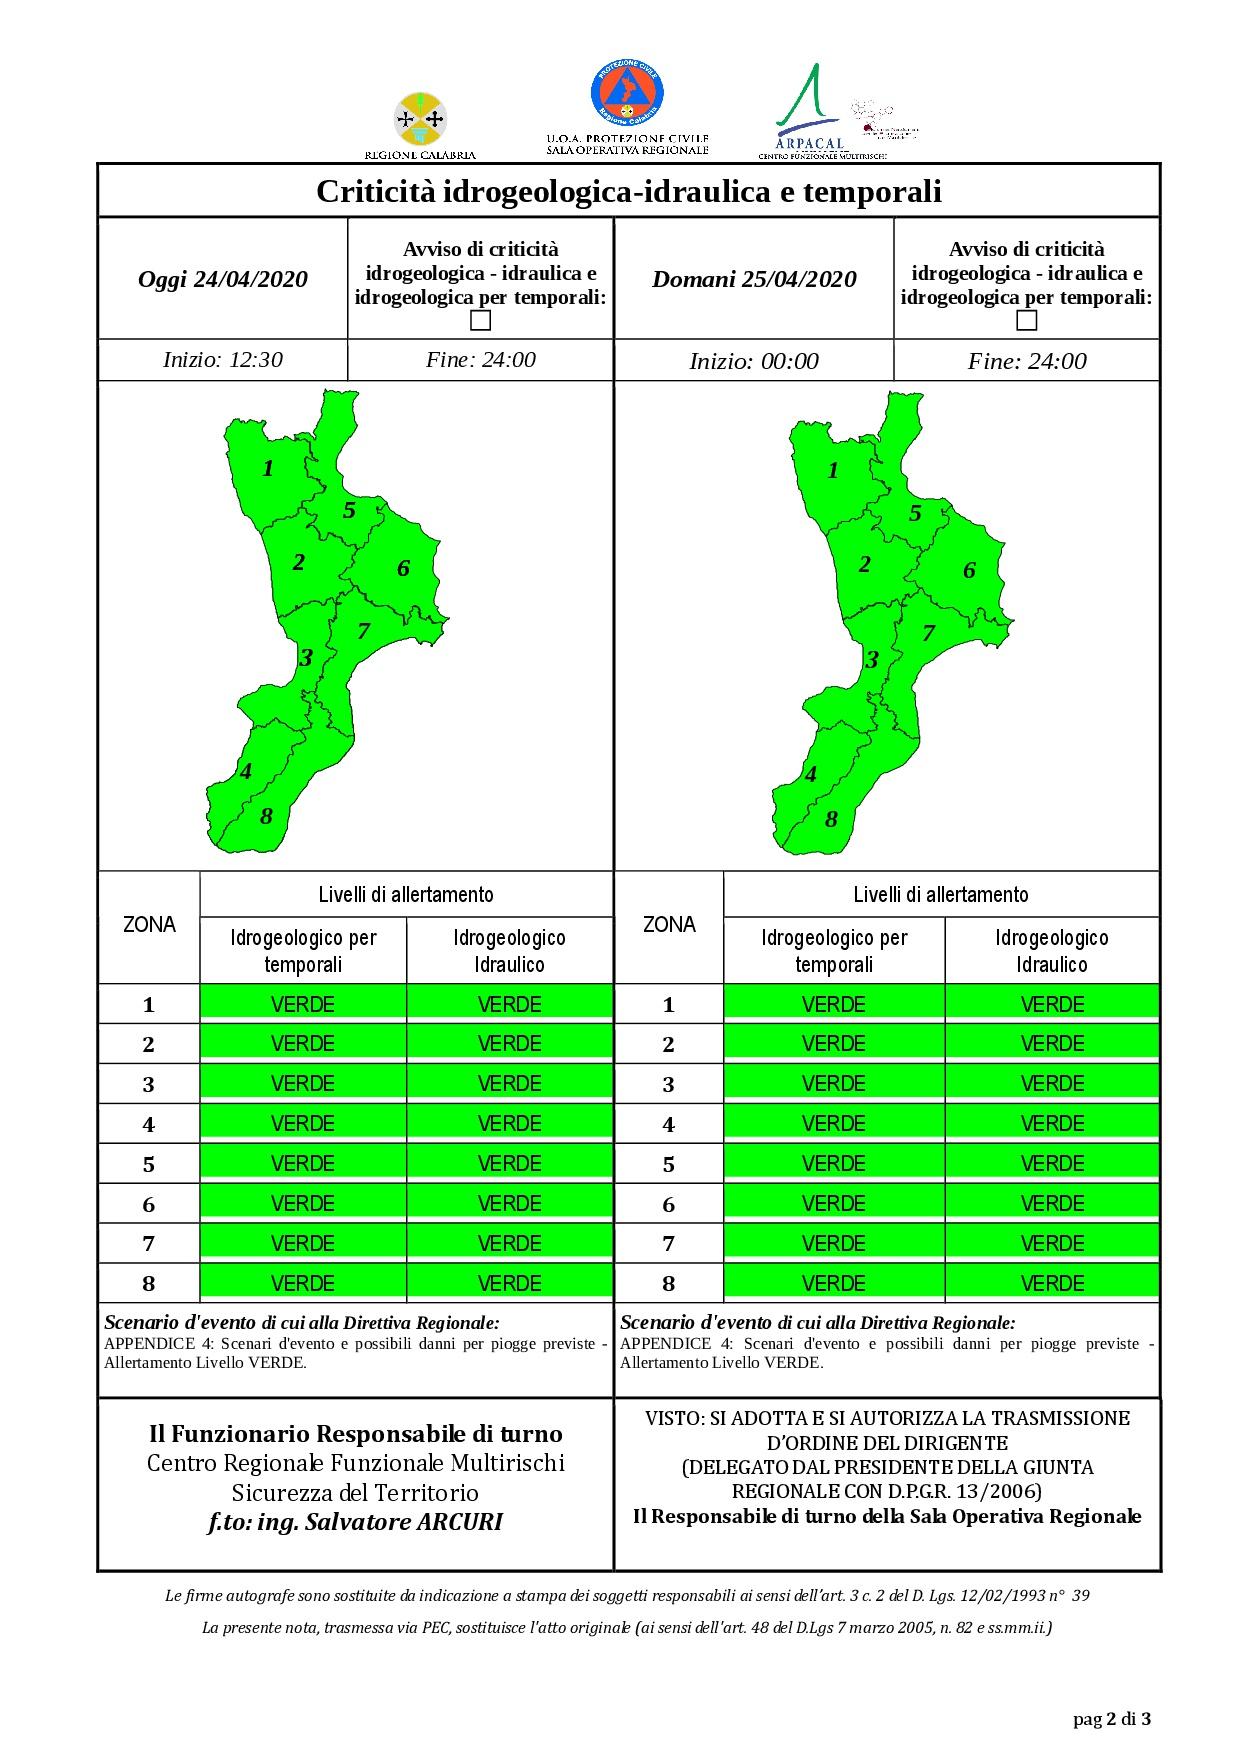 Criticità idrogeologica-idraulica e temporali in Calabria 24-04-2020